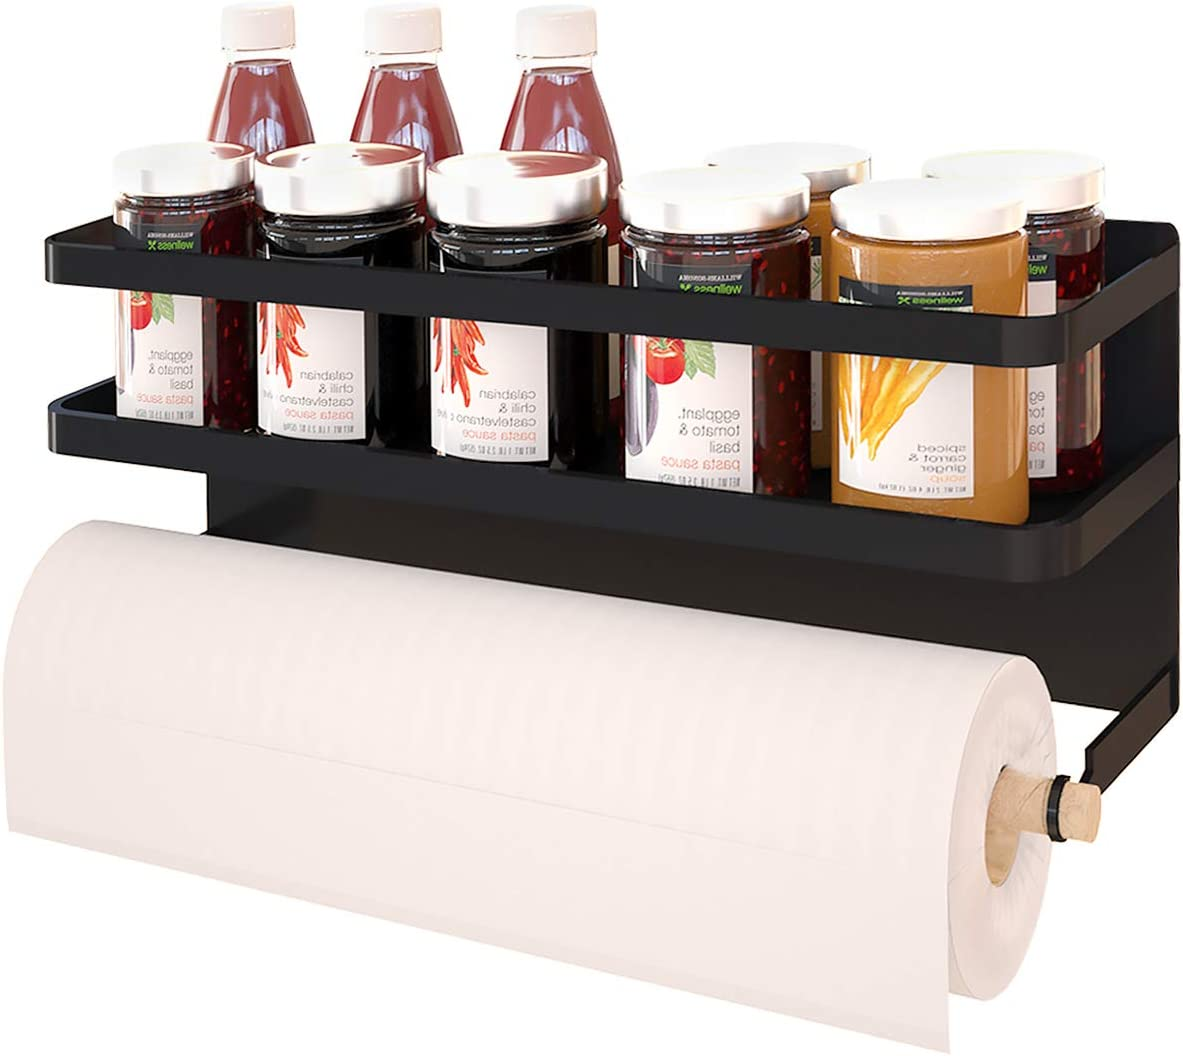 Magnetic Paper Towel Japan's largest assortment Holder Regular store Kitchen Refrigerator for To